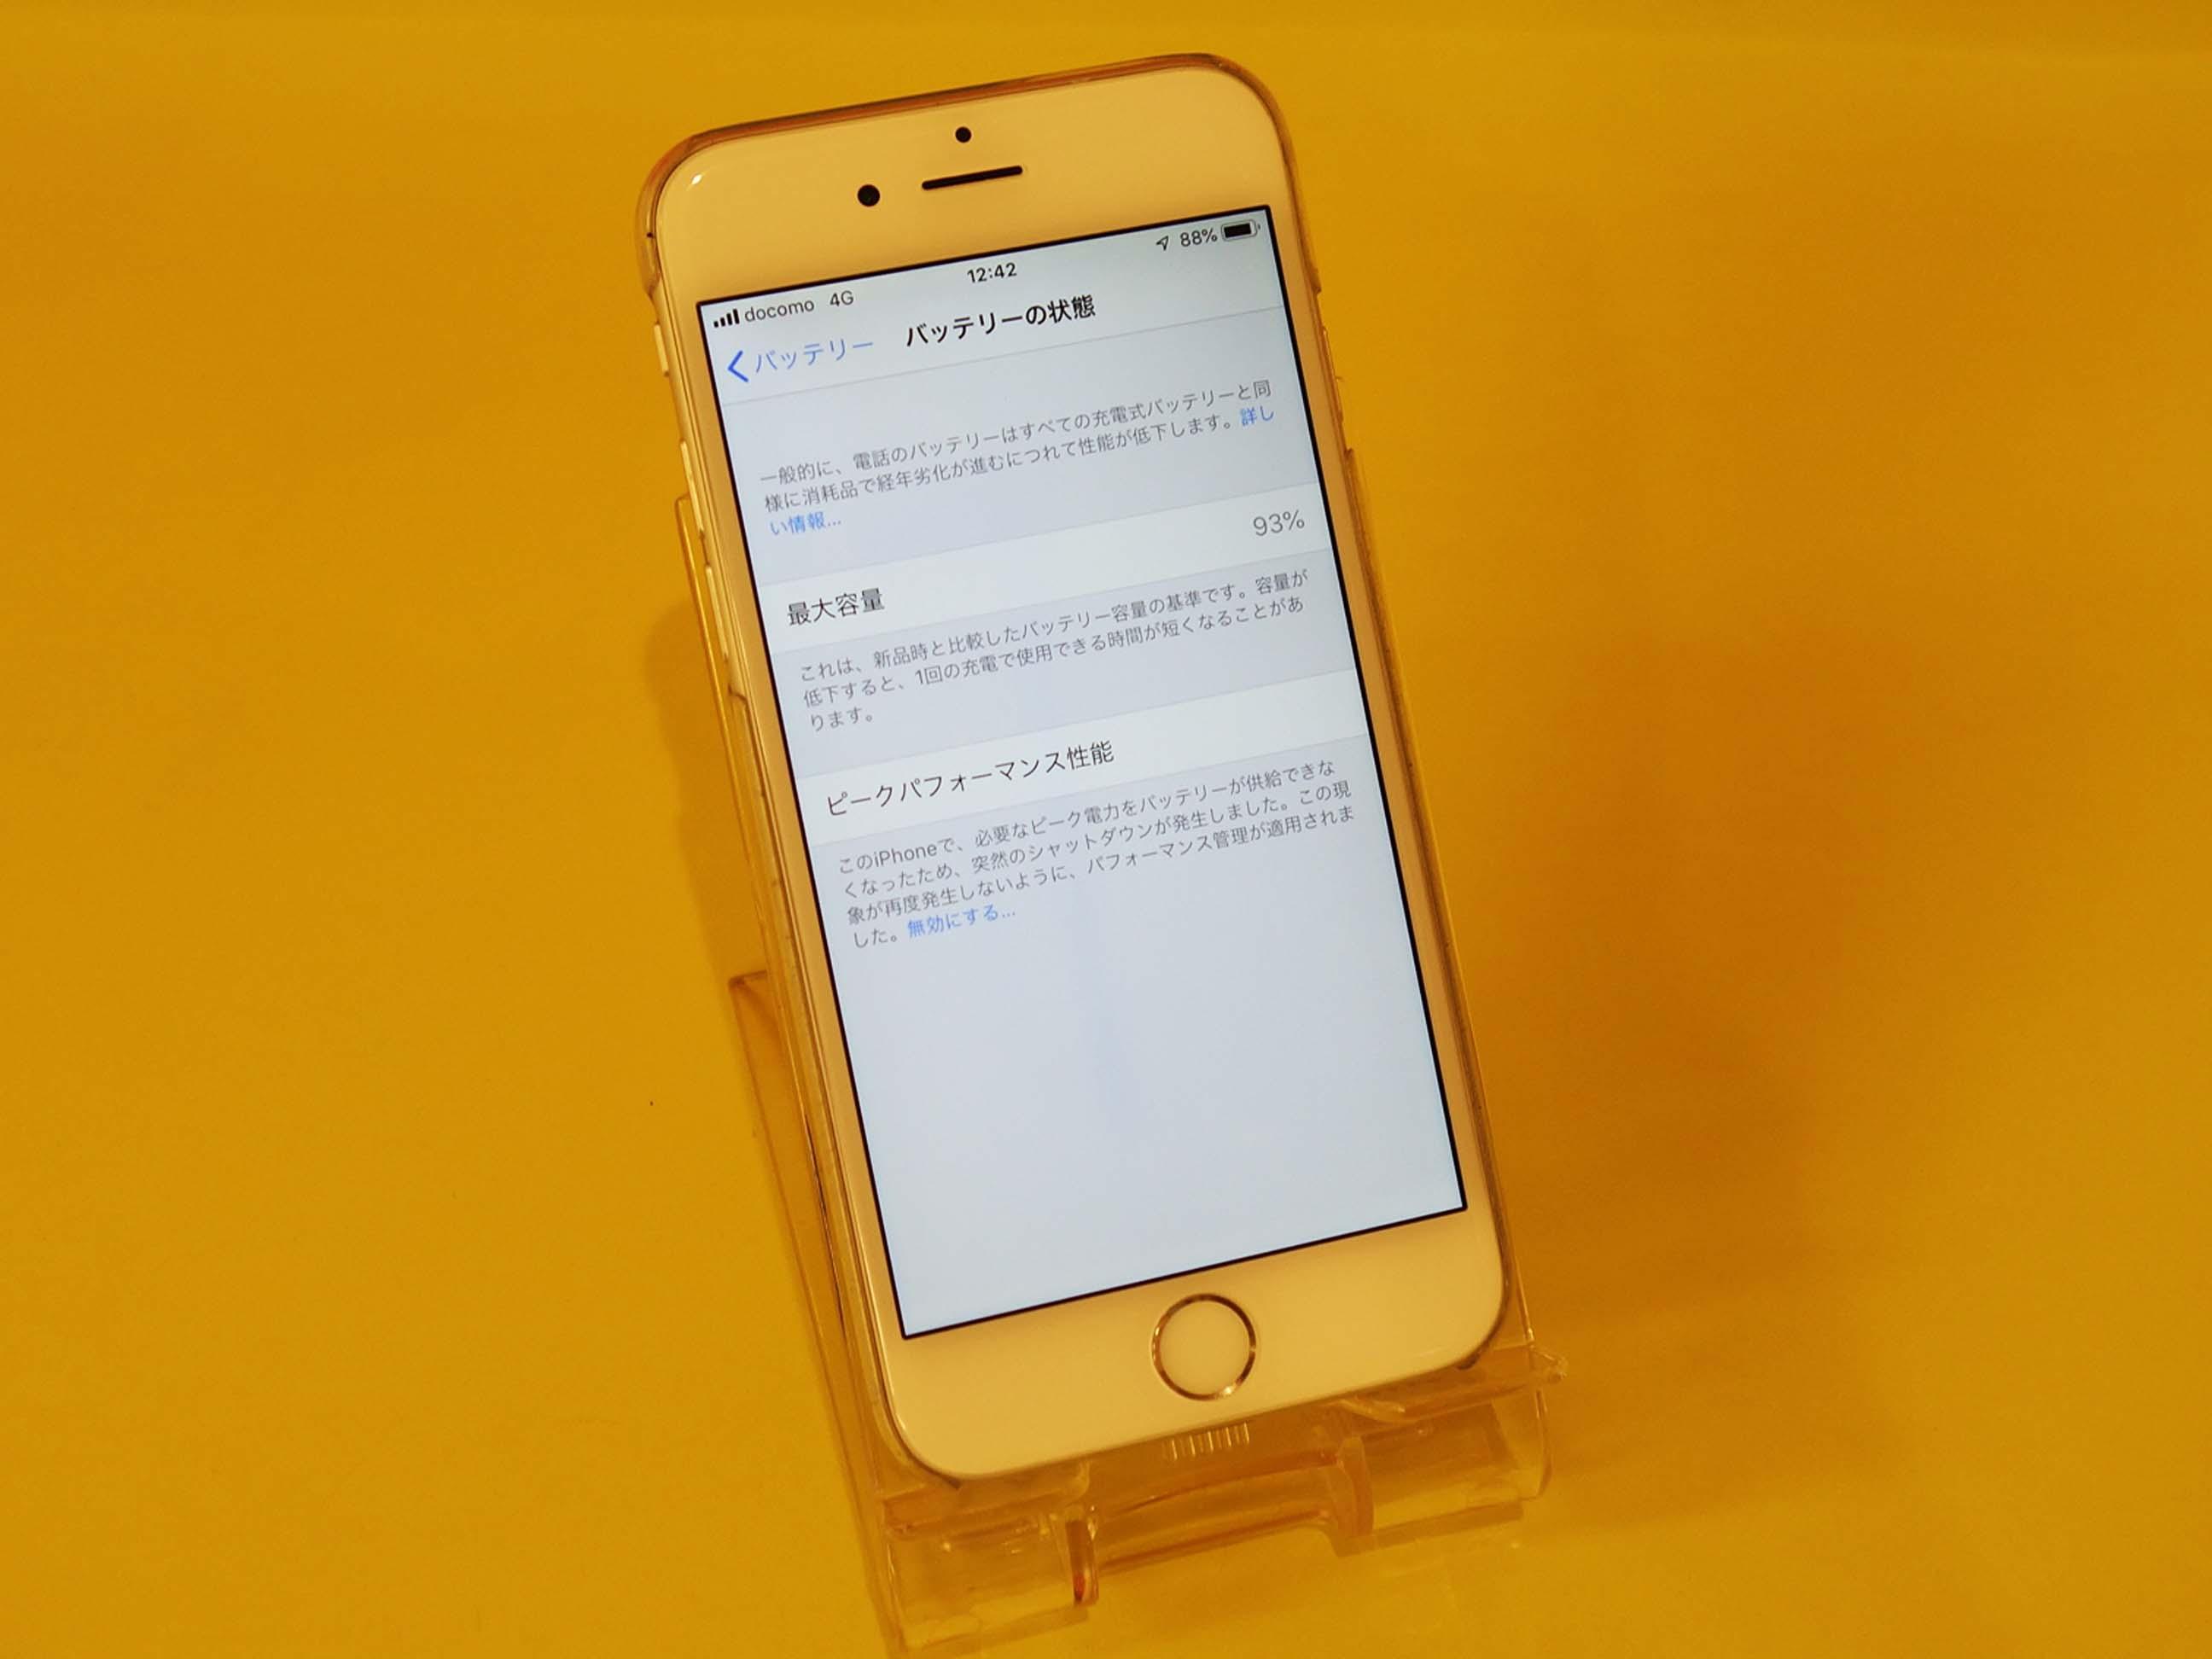 iPhone6のサイレントスイッチとバッテリー交換修理で伊勢市からご来店!アイフォン修理のクイック名古屋